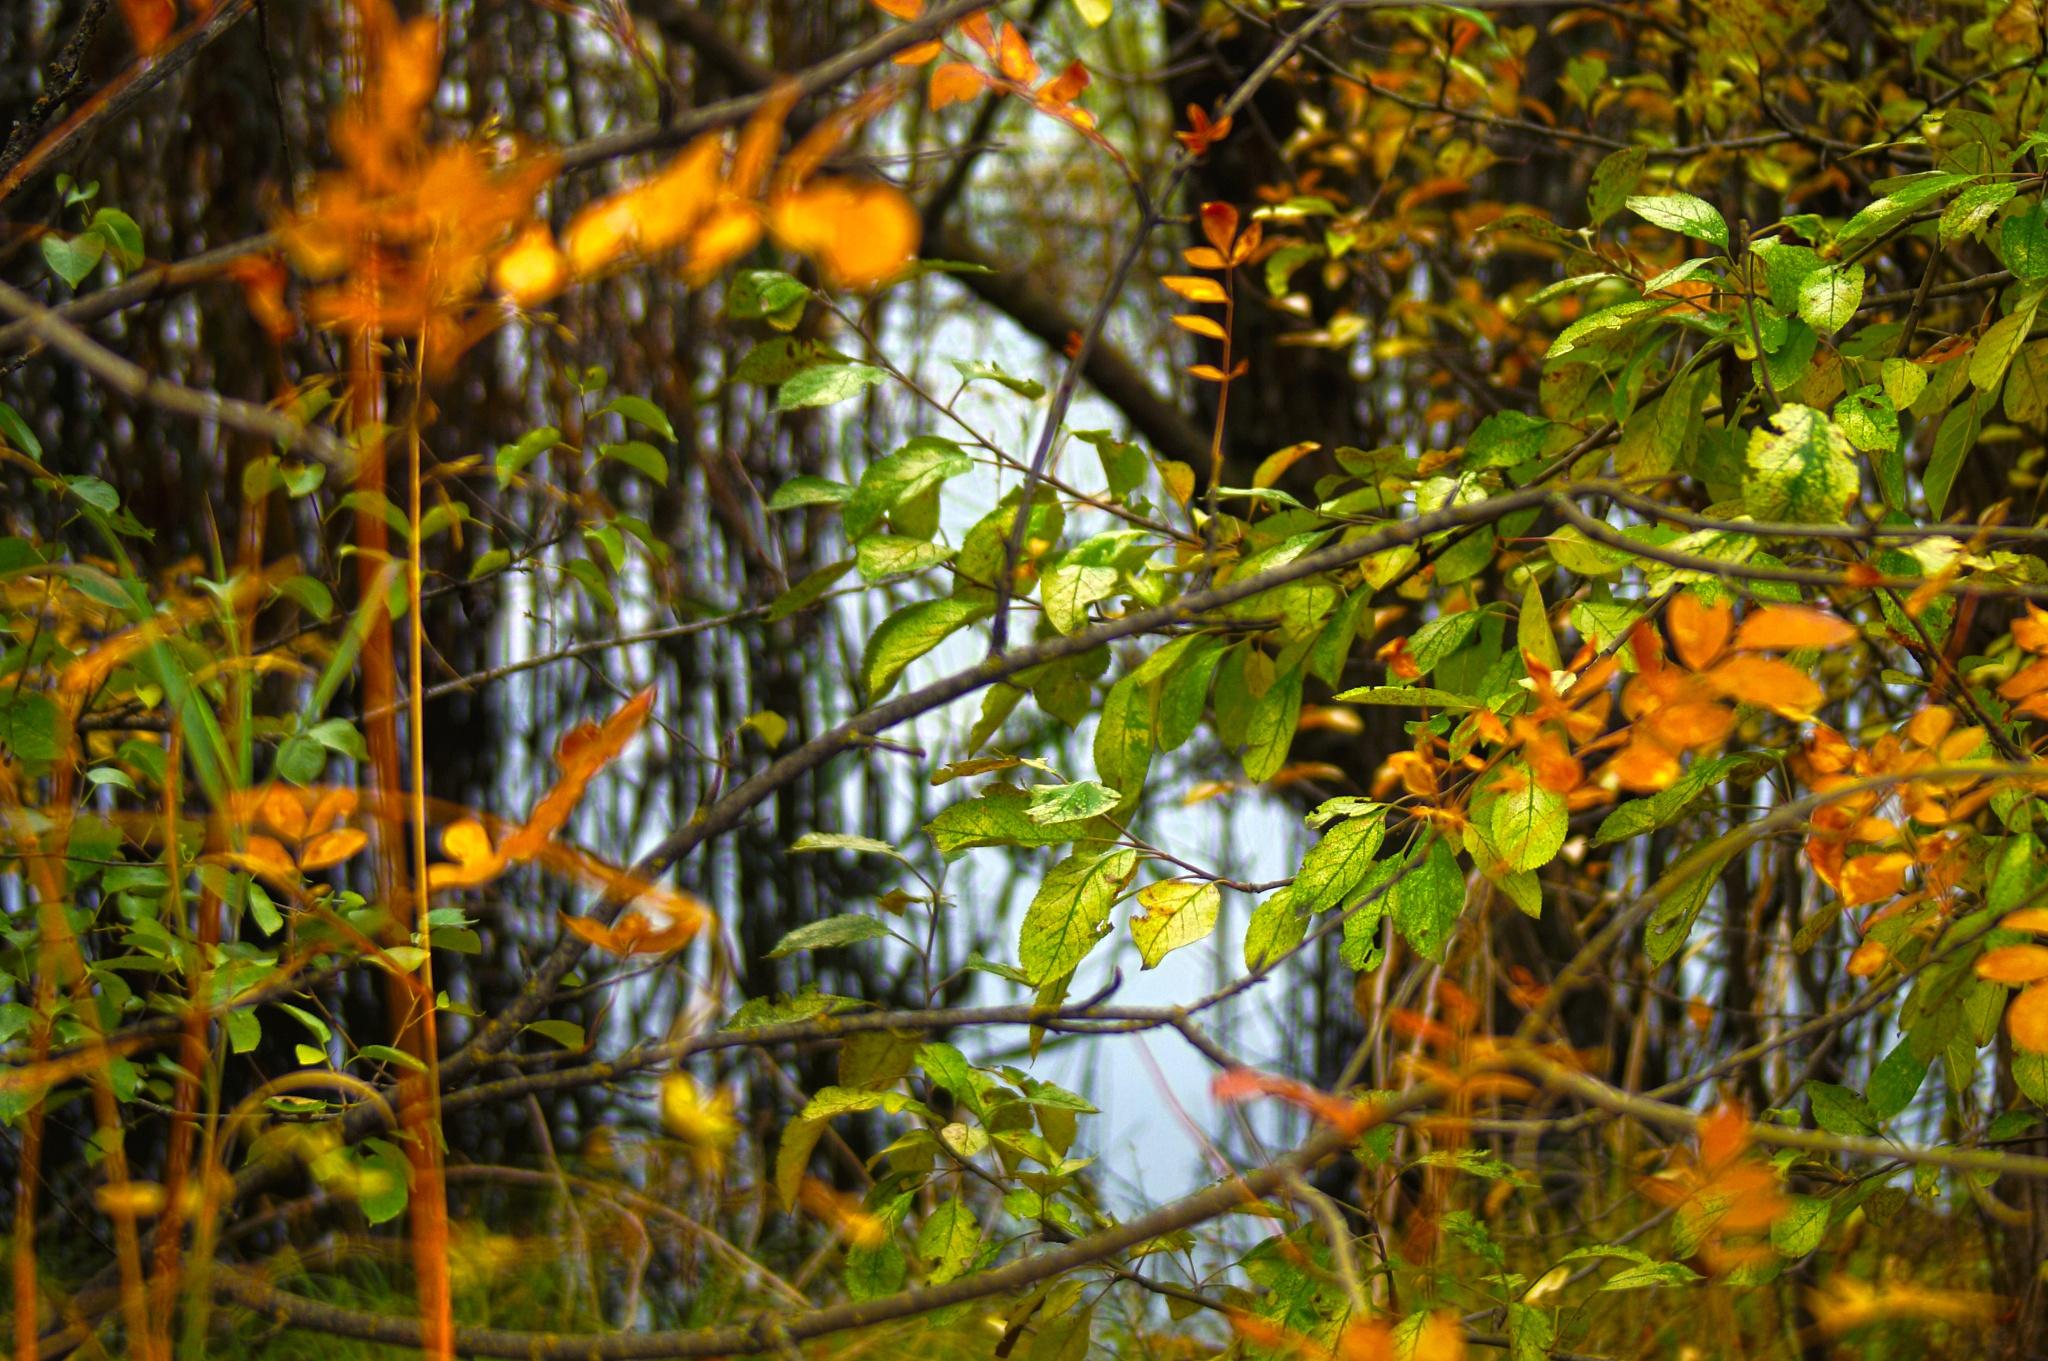 Green Curtain by Blackhawk